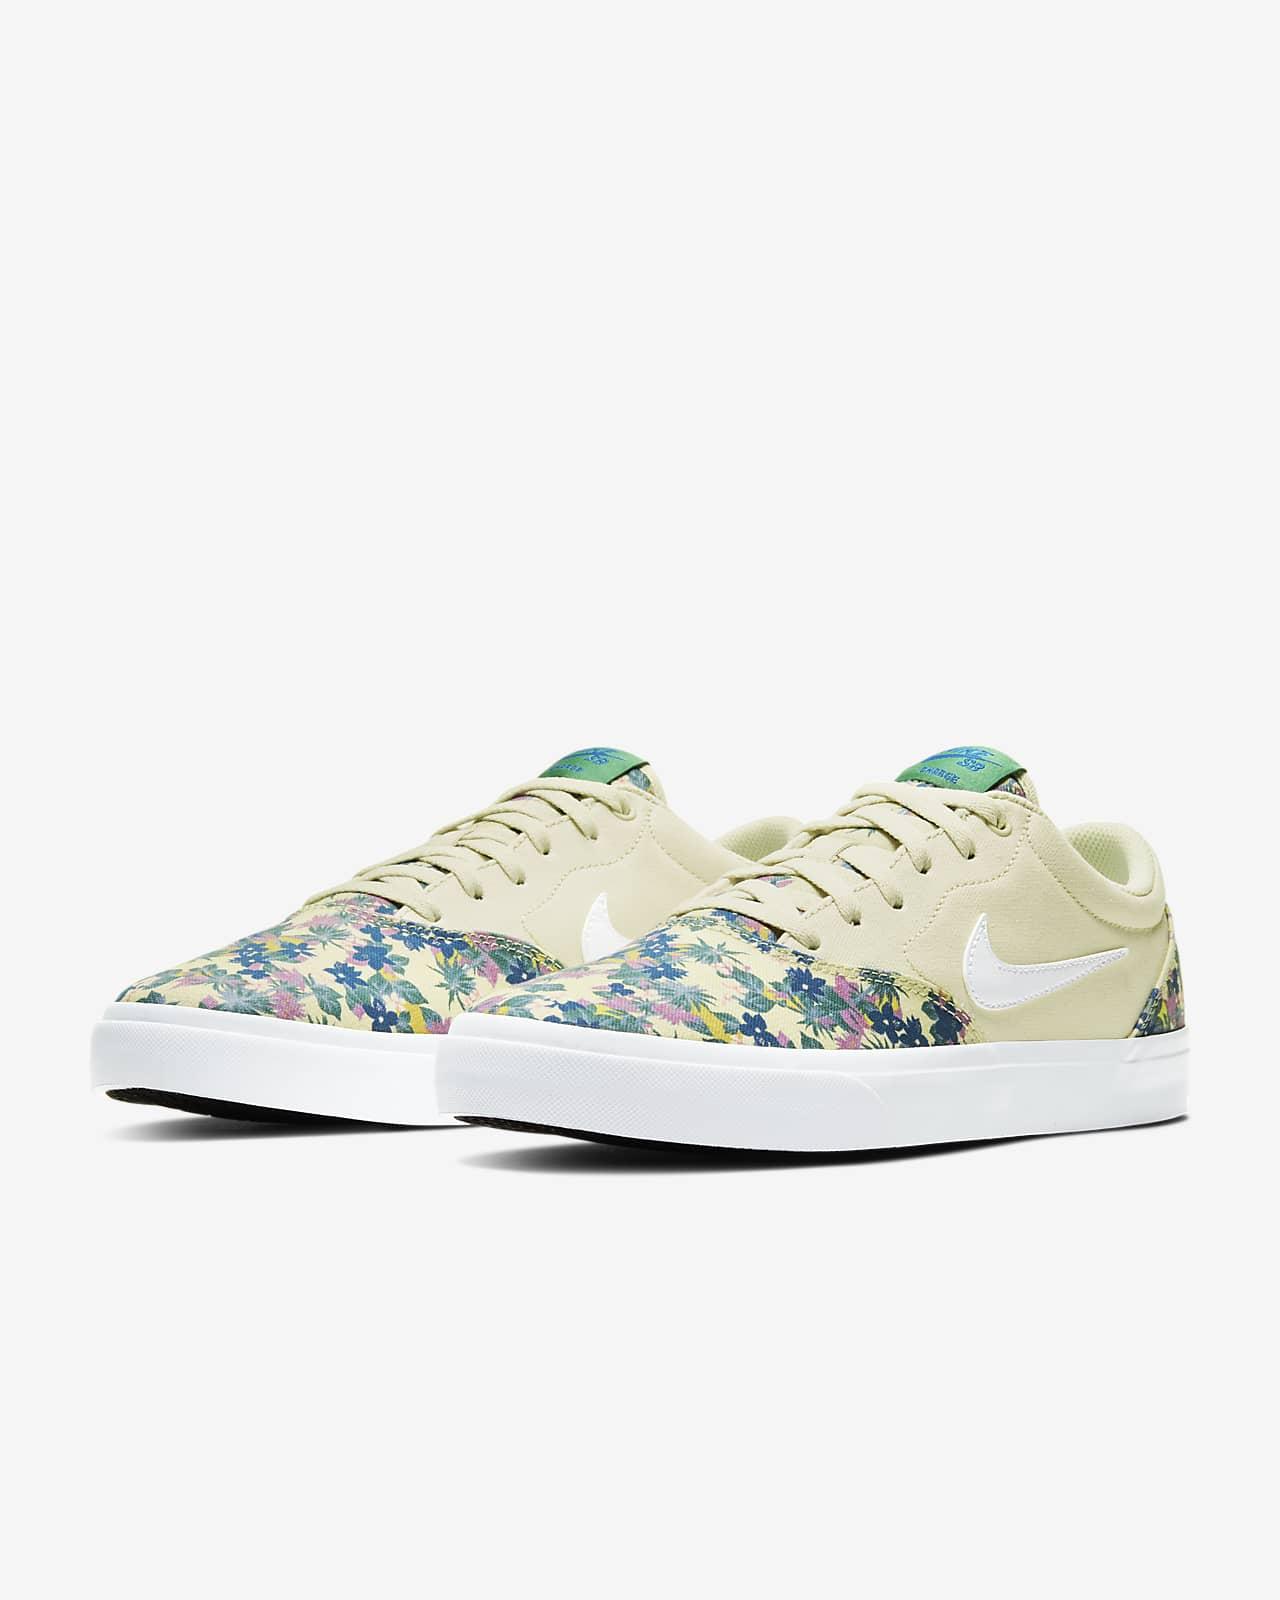 Nike SB Charge Premium Skate Shoe